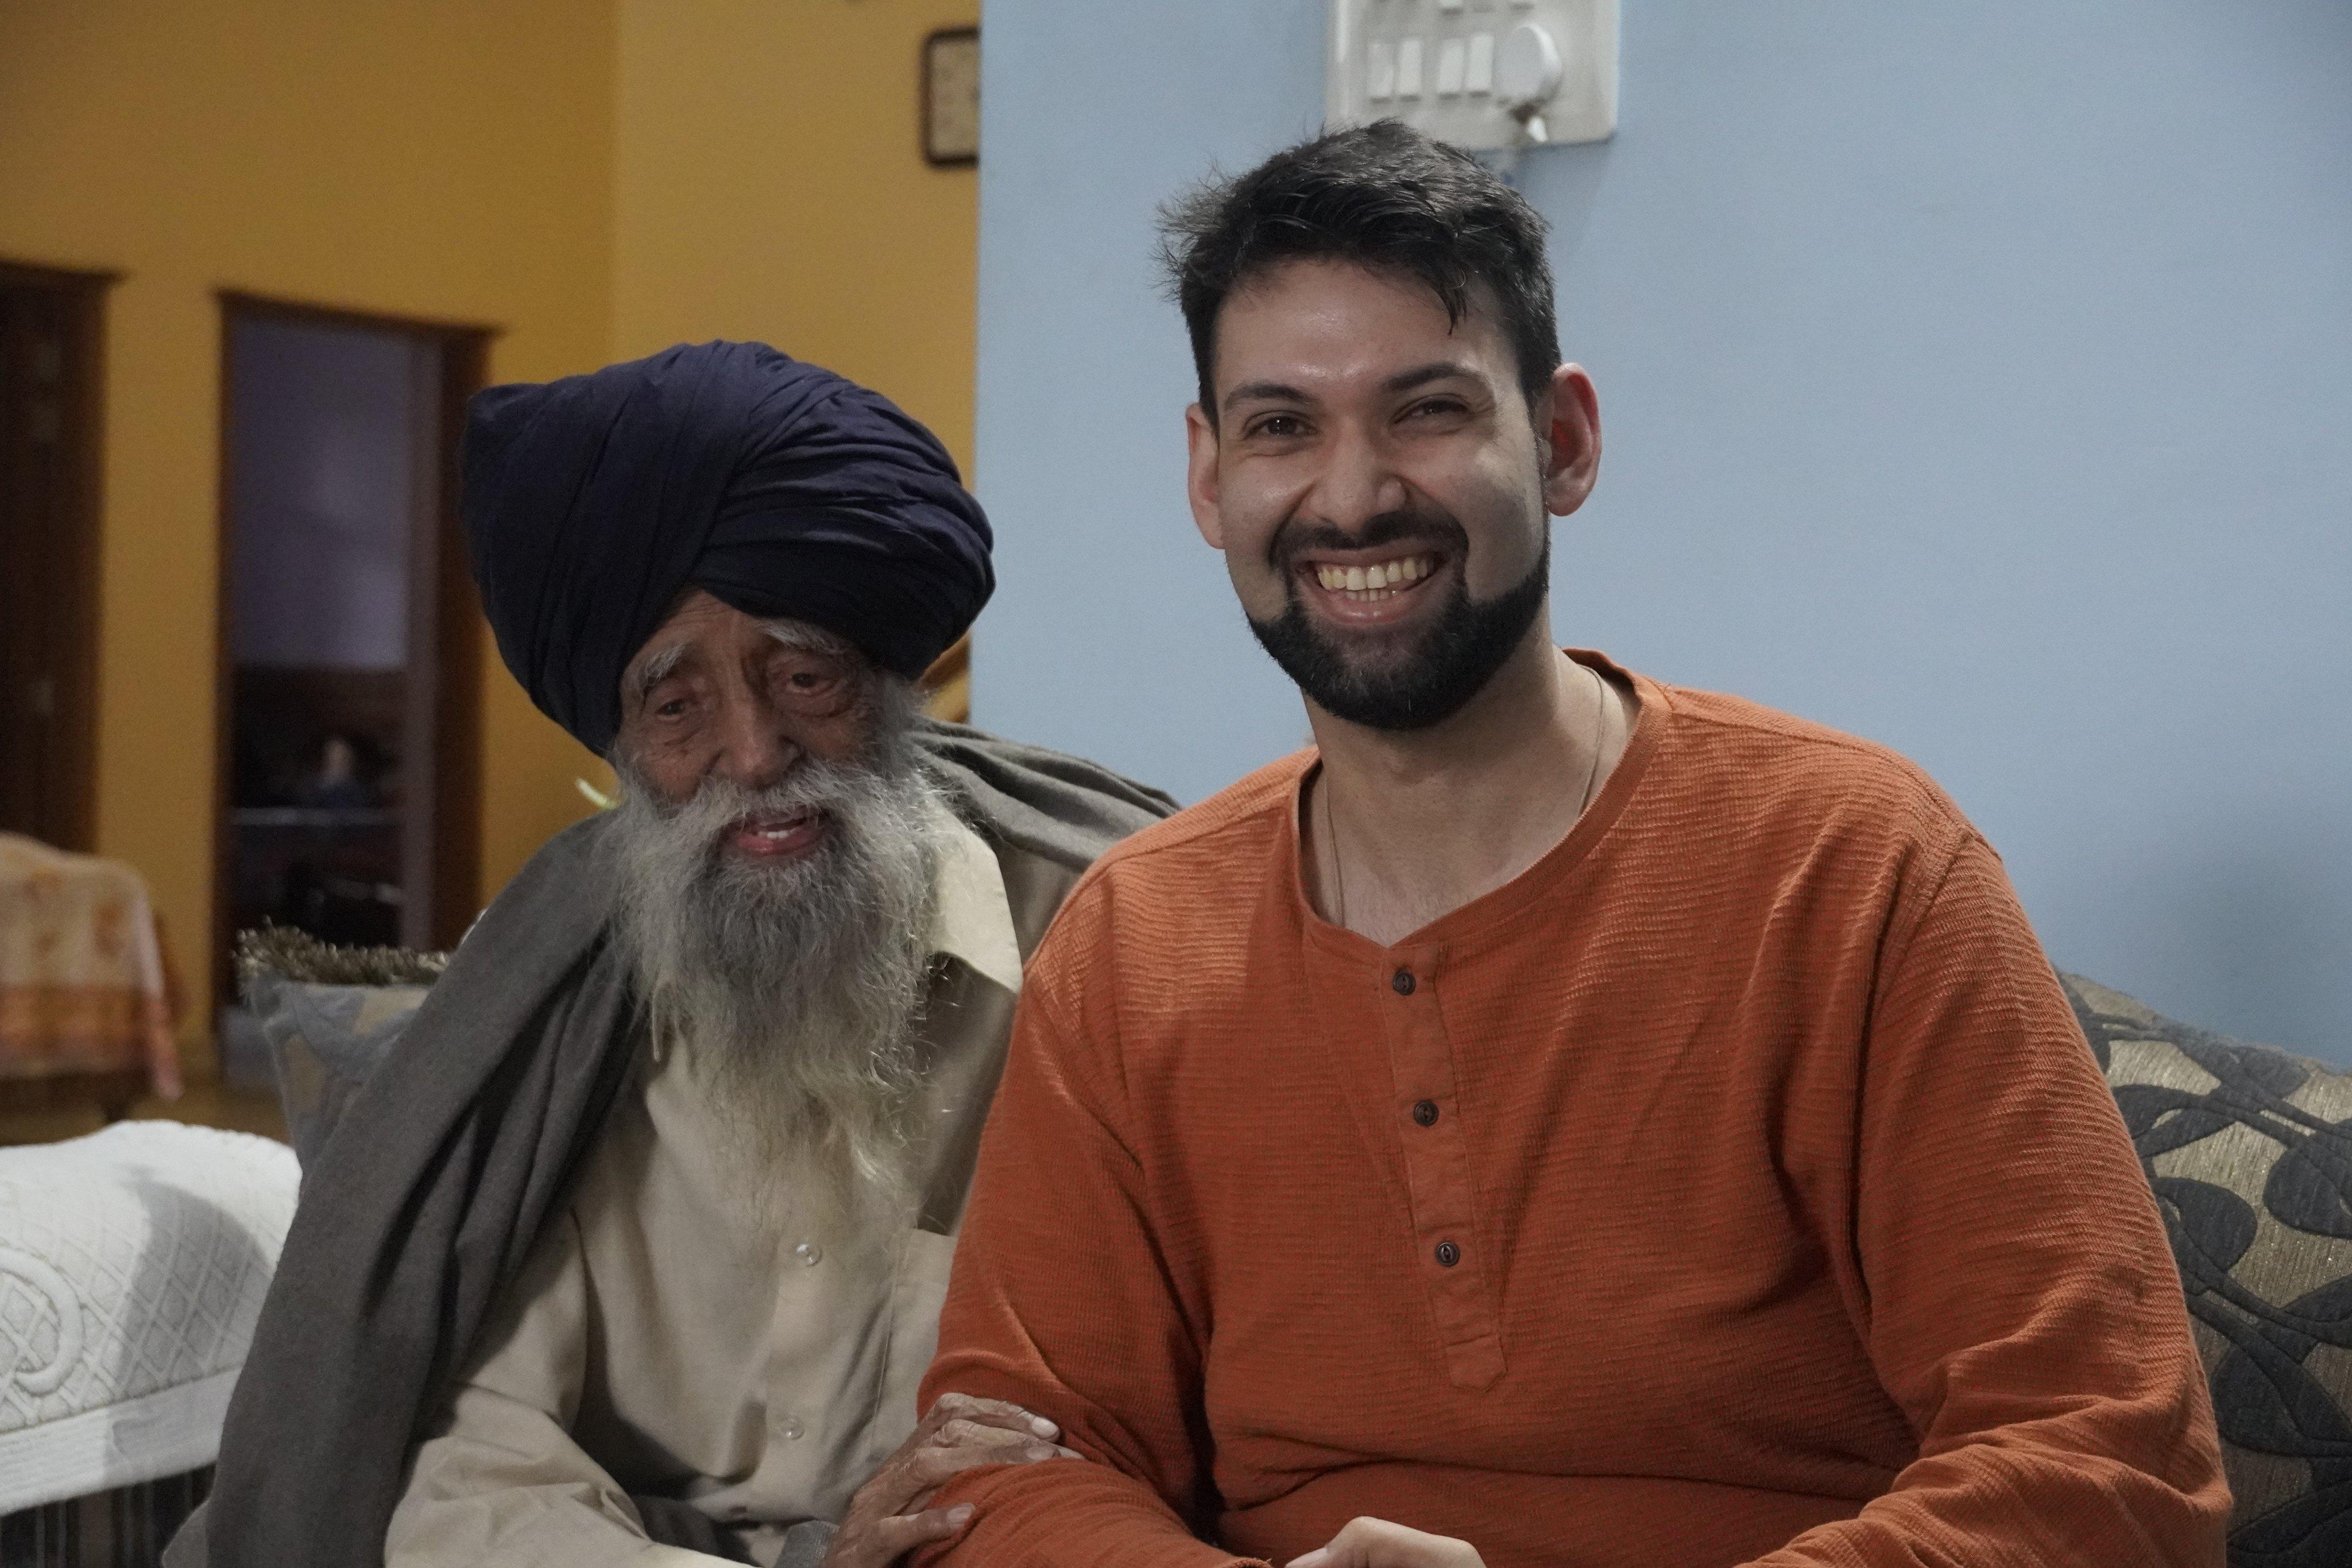 Fauja Singh and Ojaswwee Sharma